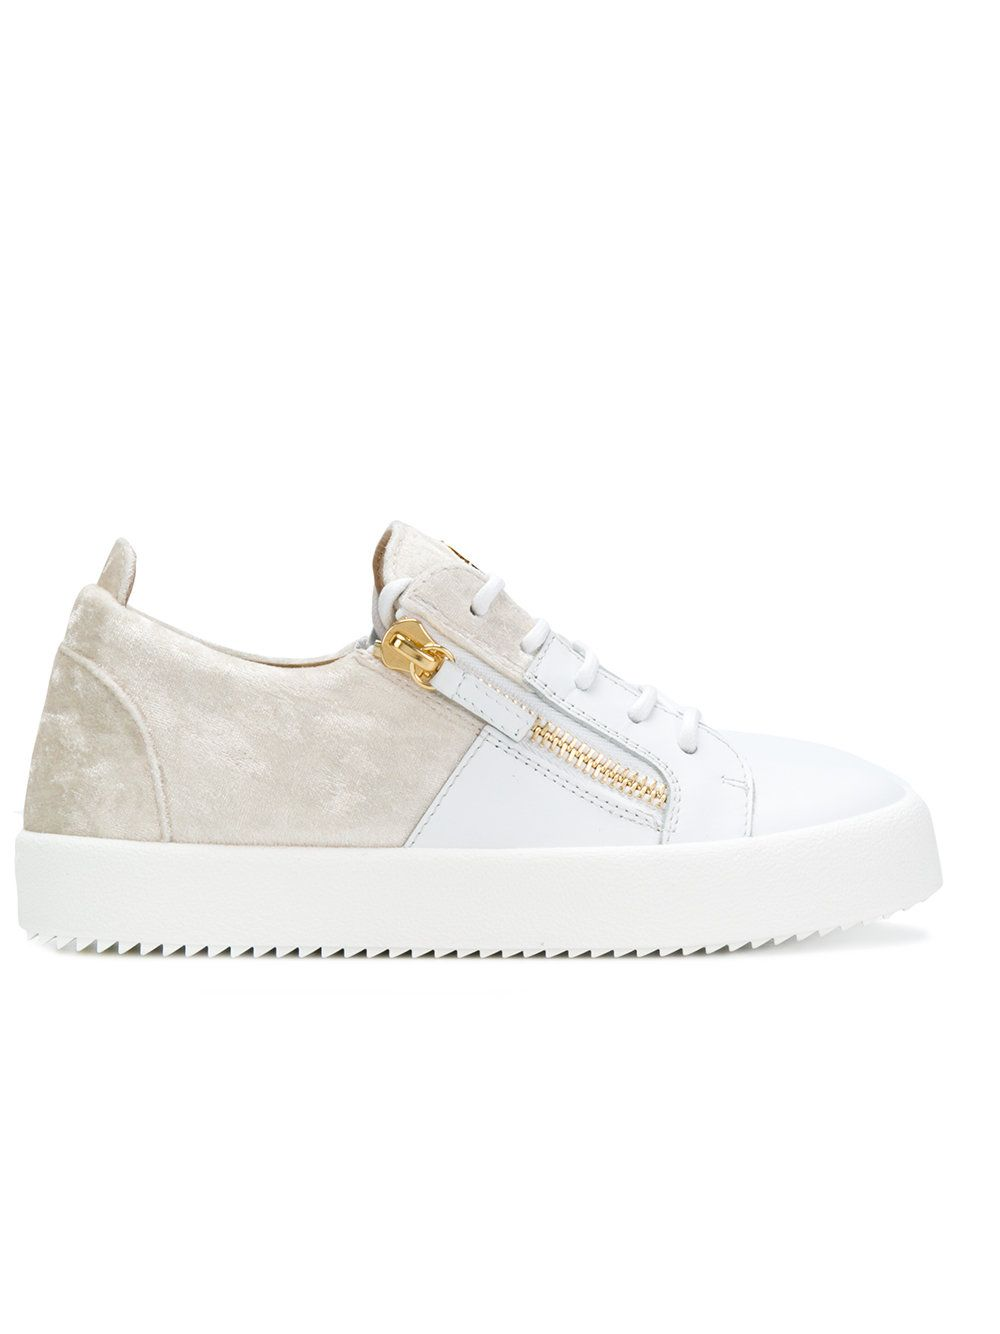 08a73078d3366 GIUSEPPE ZANOTTI DESIGN   Nicki low top sneakers #Shoes #GIUSEPPE ZANOTTI  DESIGN